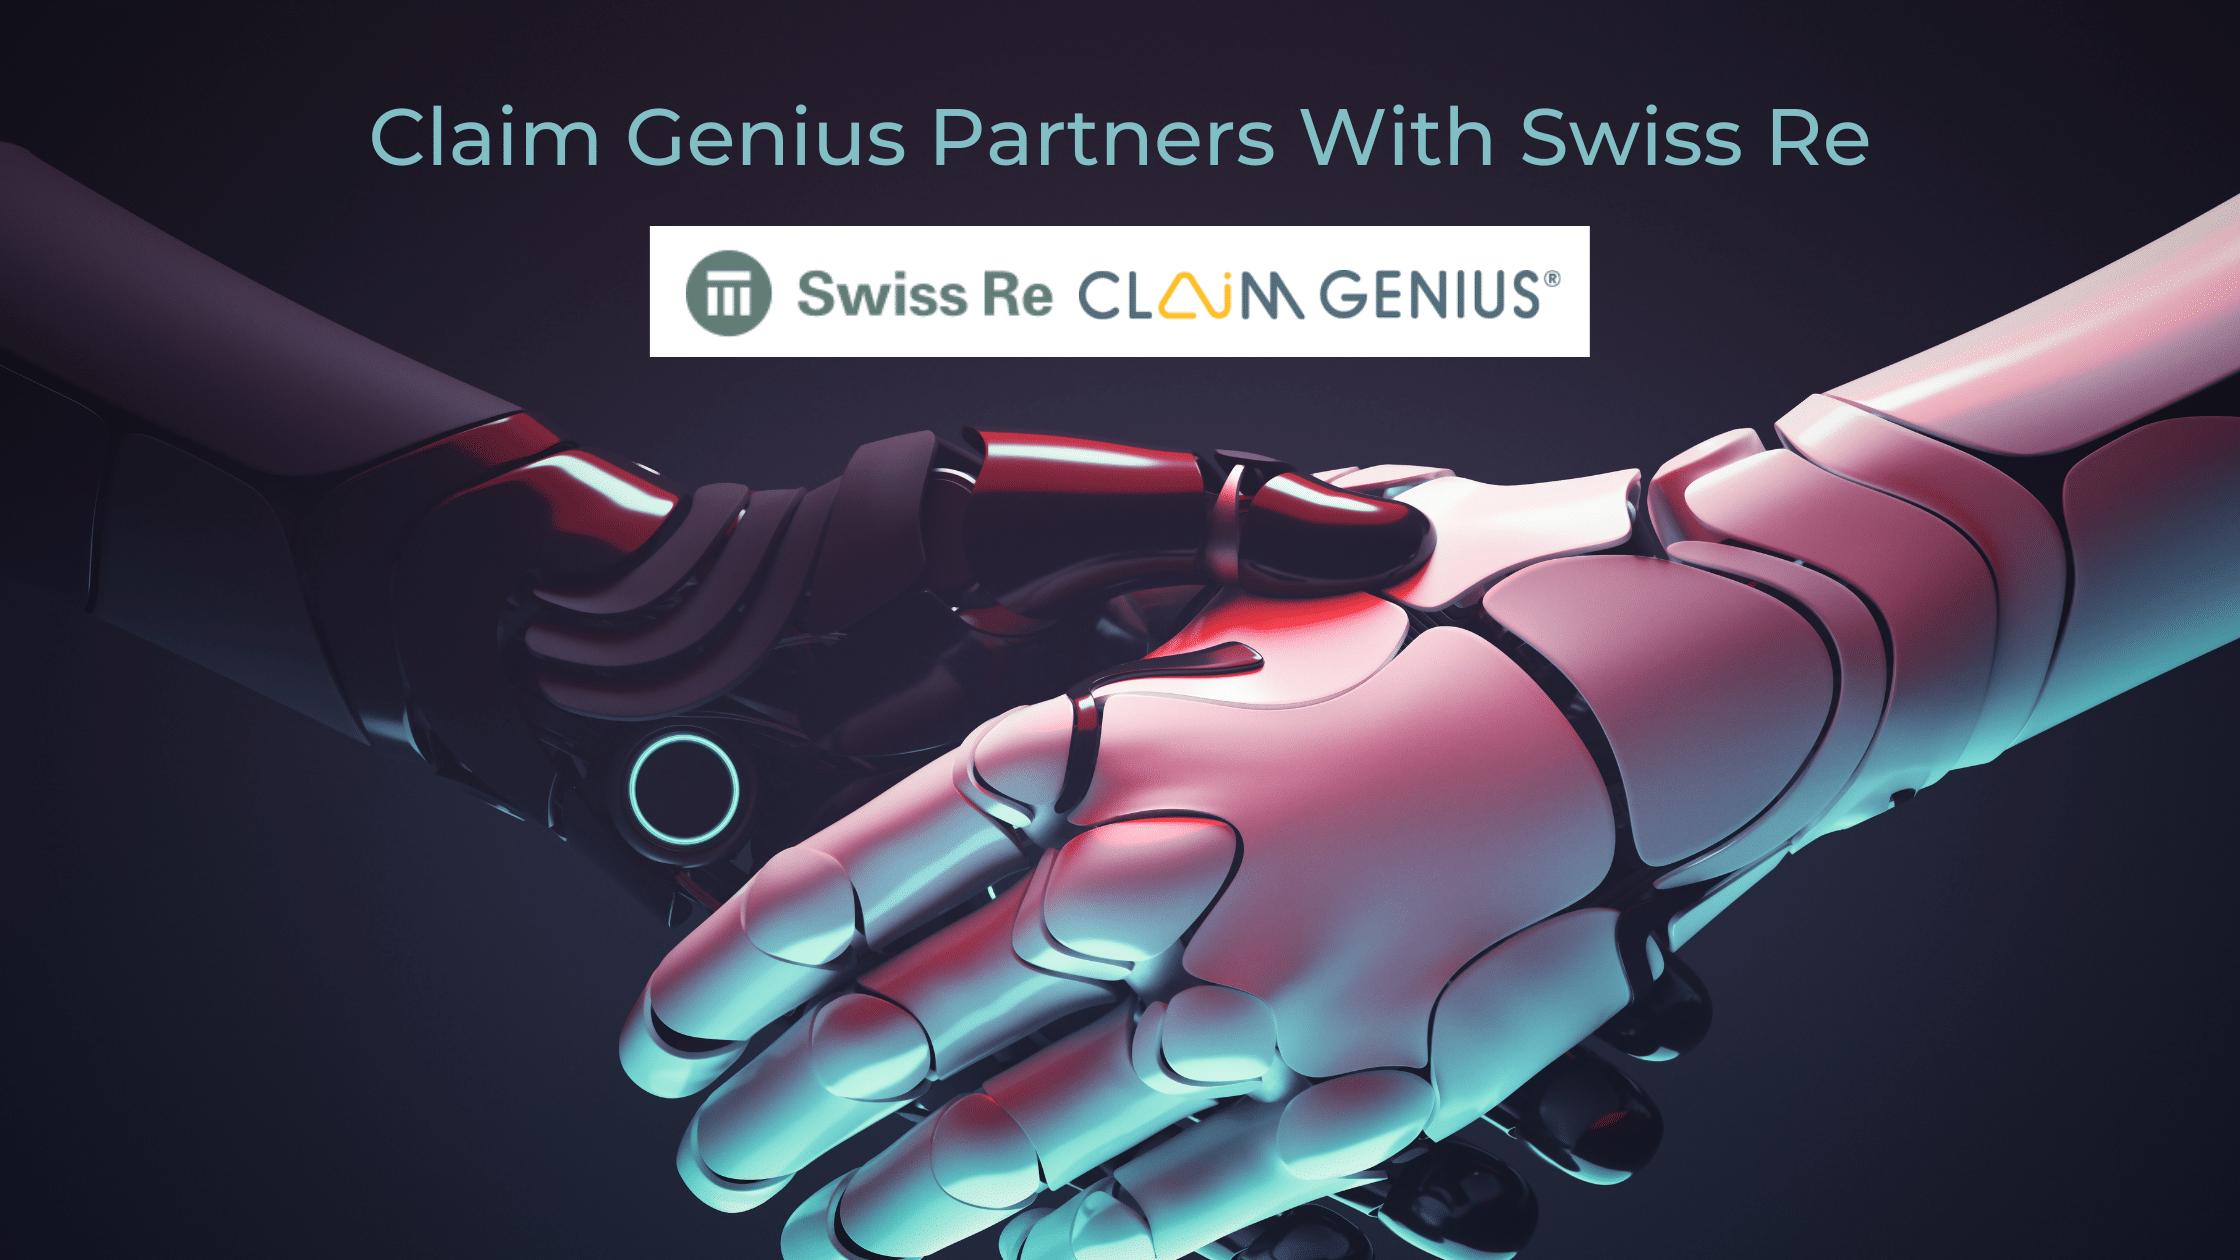 Claim Genius Partners With Swiss Re